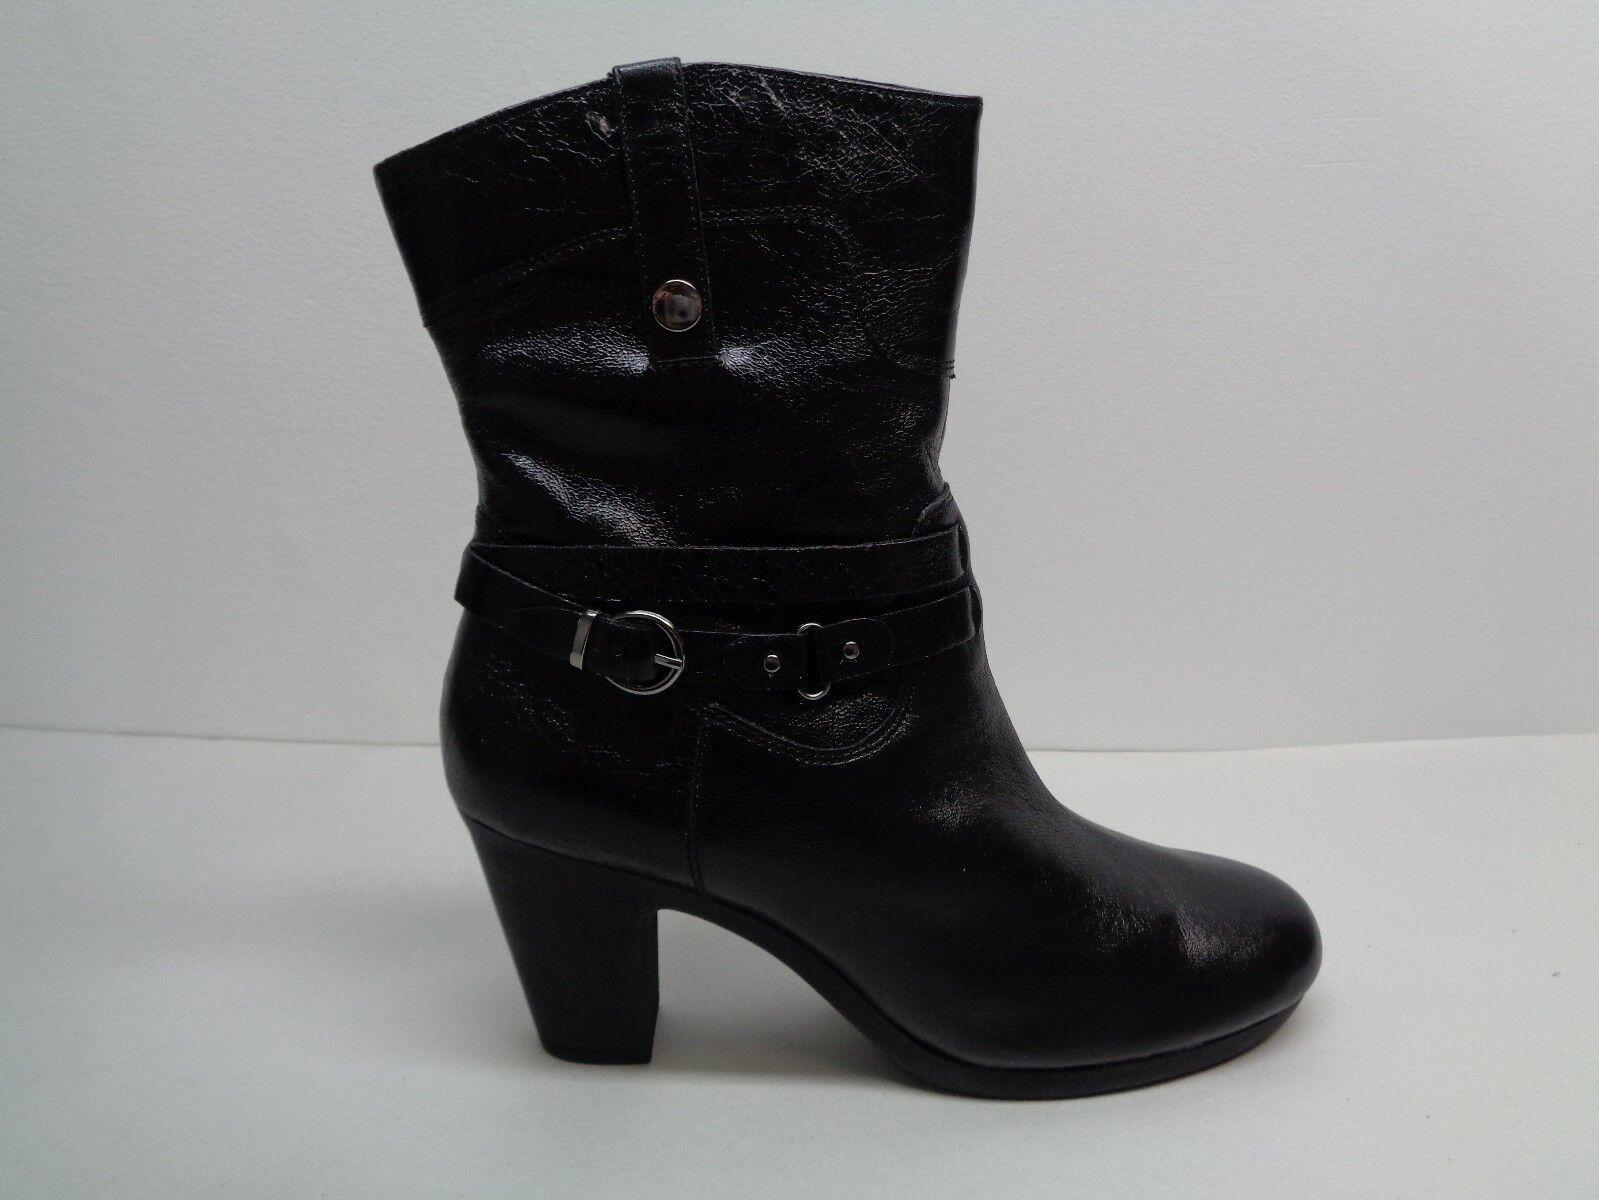 Aerosoles Größe M 11 M Größe SERIAL PORT Leder Ankle Heels Stiefel New Damenschuhe Schuhes 40dcbf